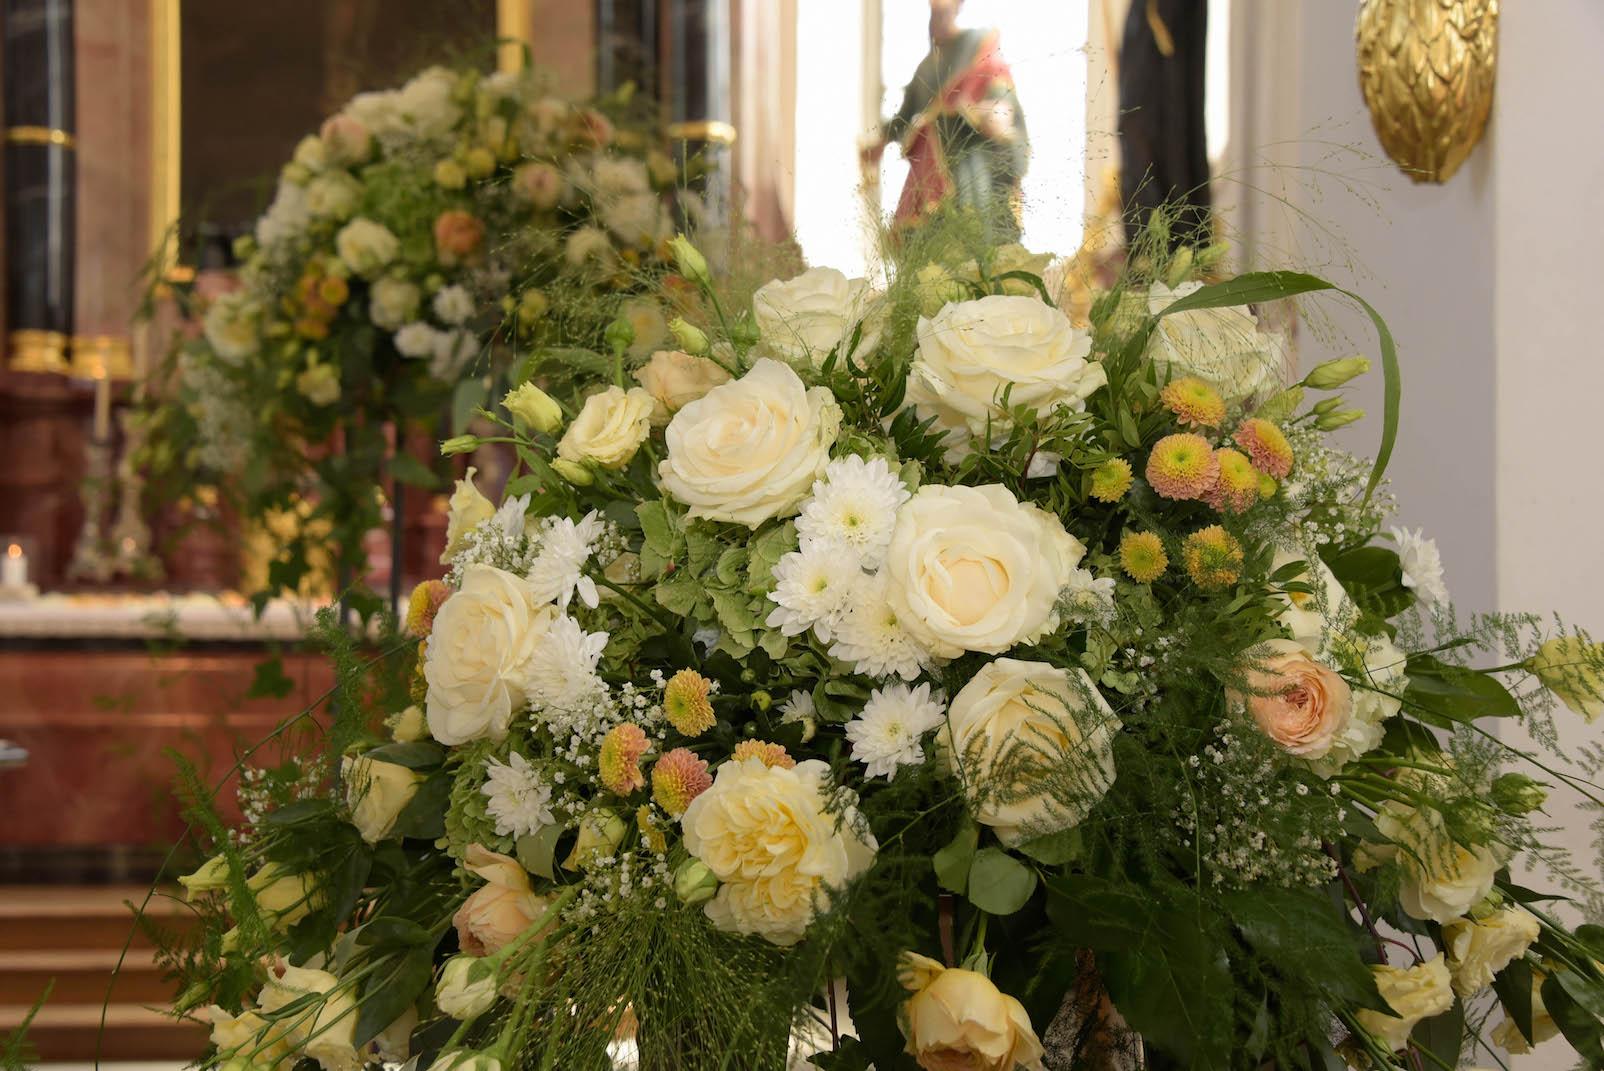 Blumenschmuck Kirche Hochzeit Resultado De Imagem Para